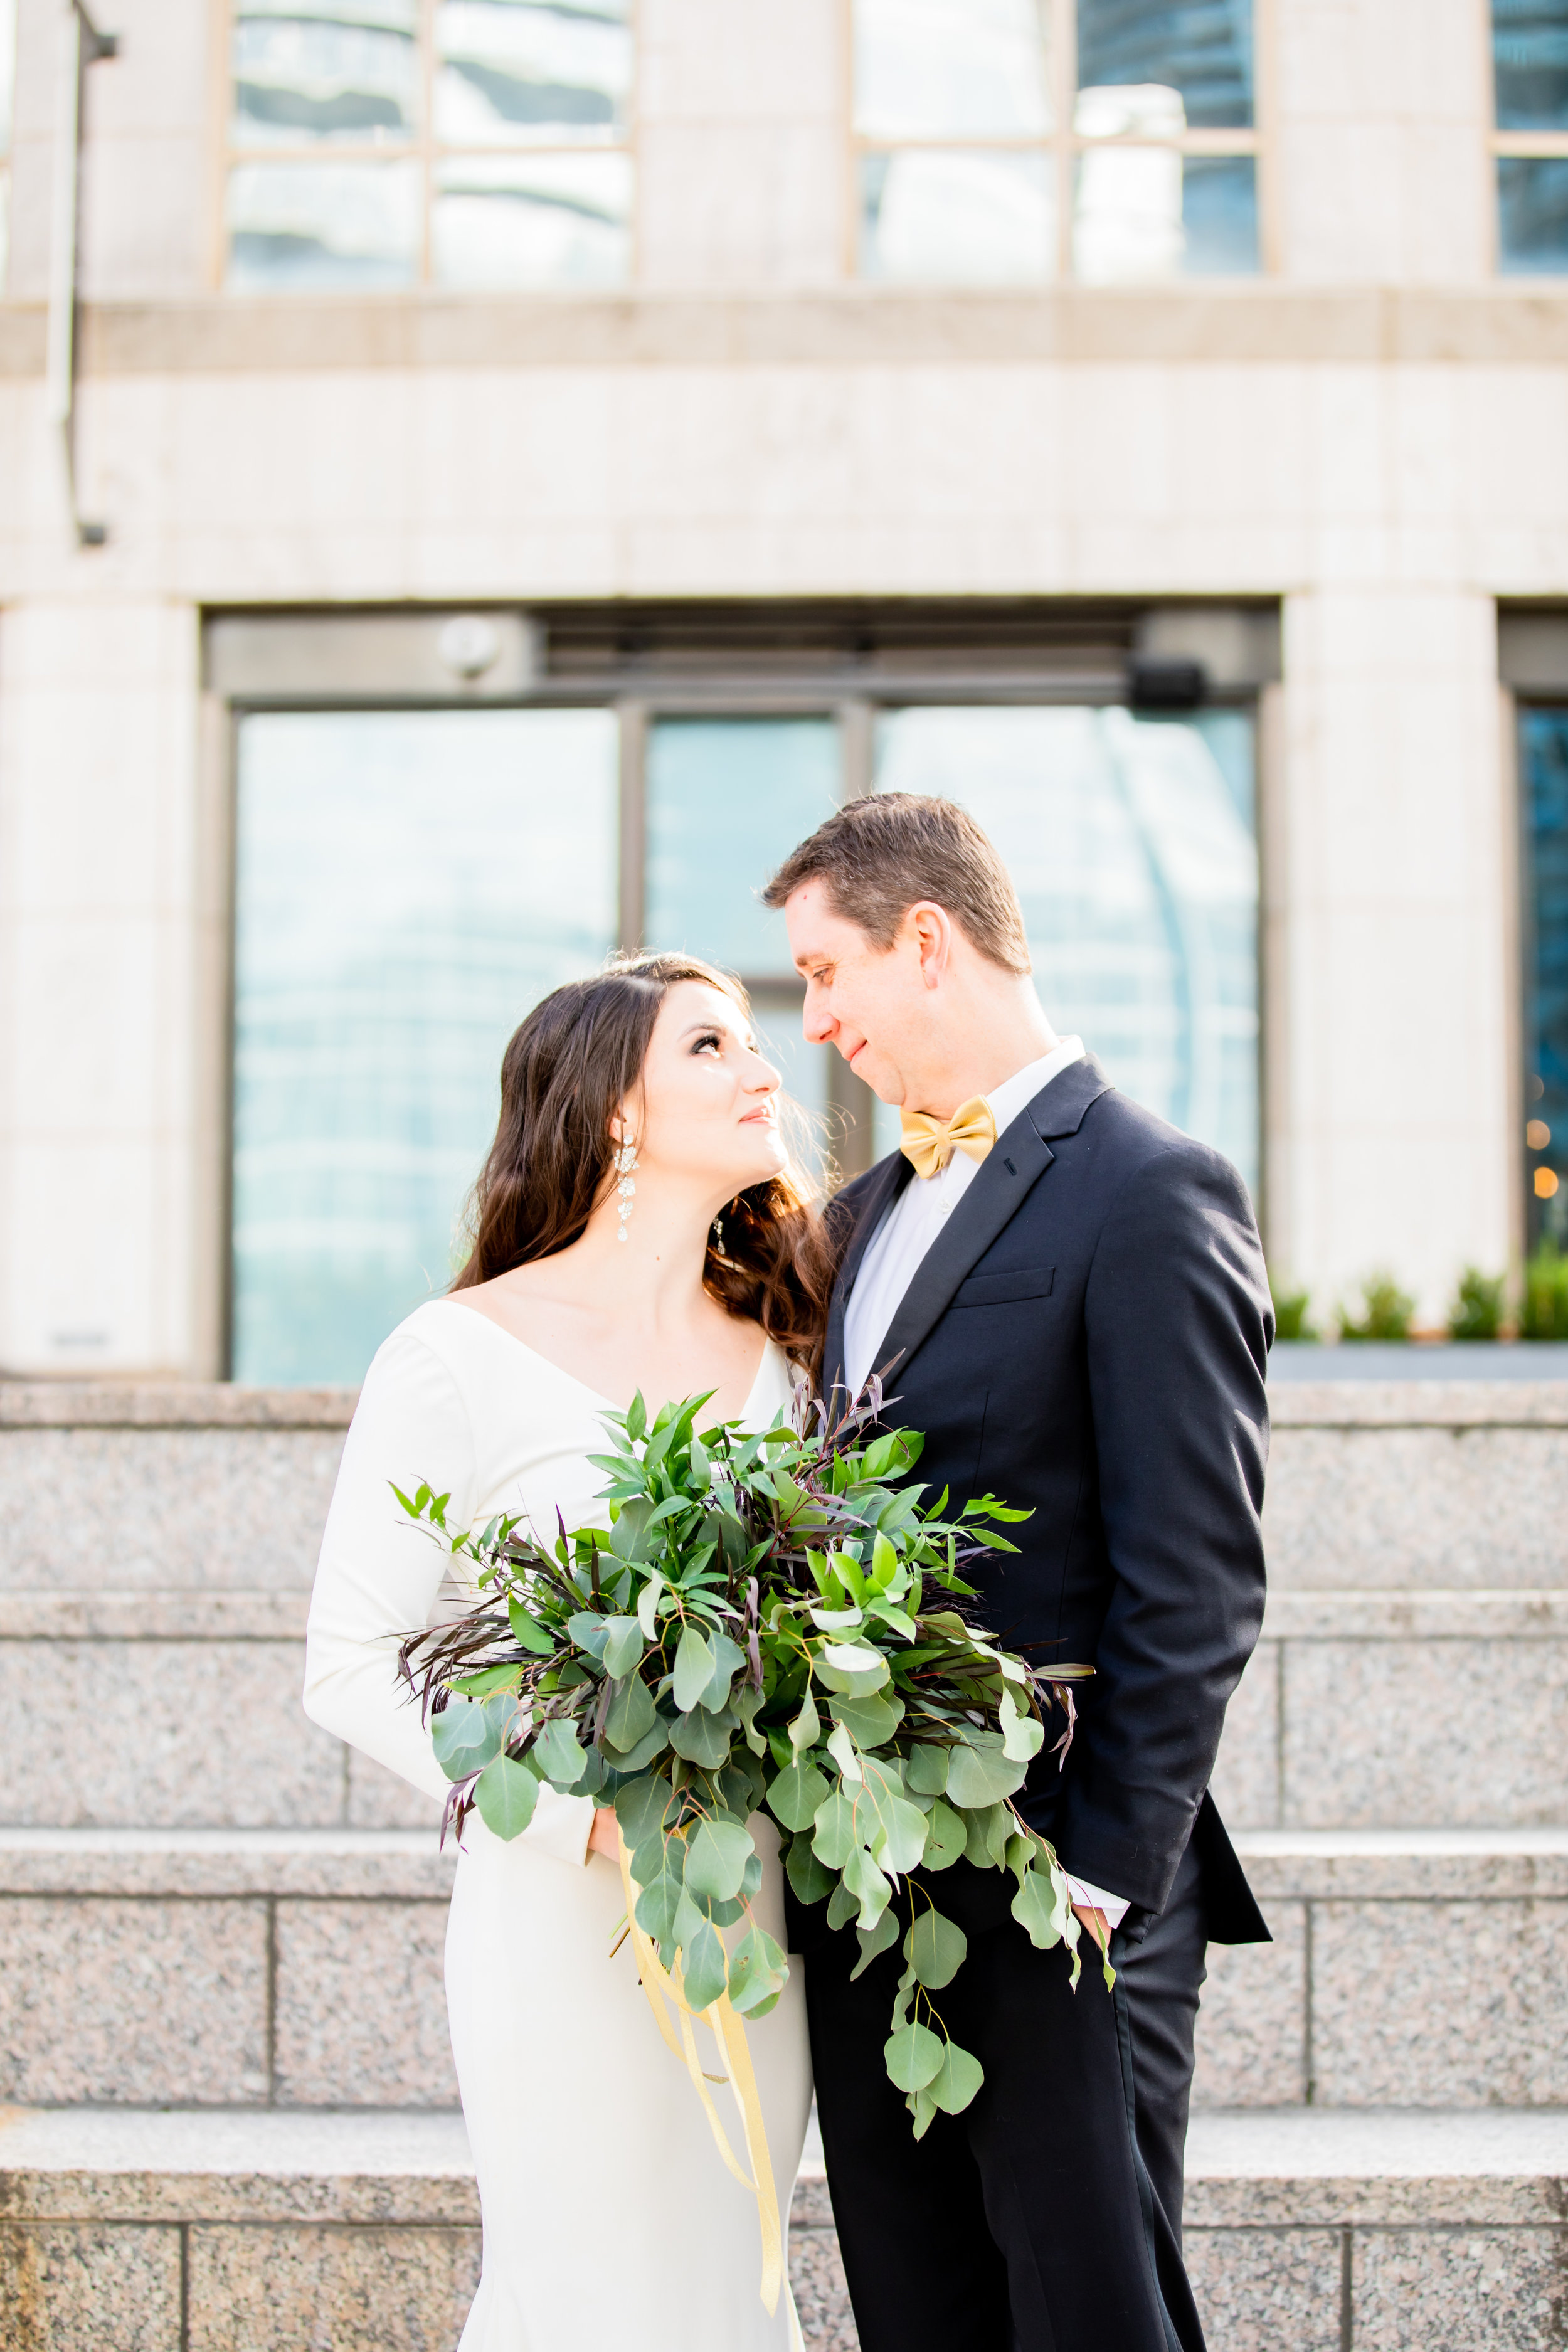 Wedding_Atlanta_Emily_Lester_Photography-1139.jpg